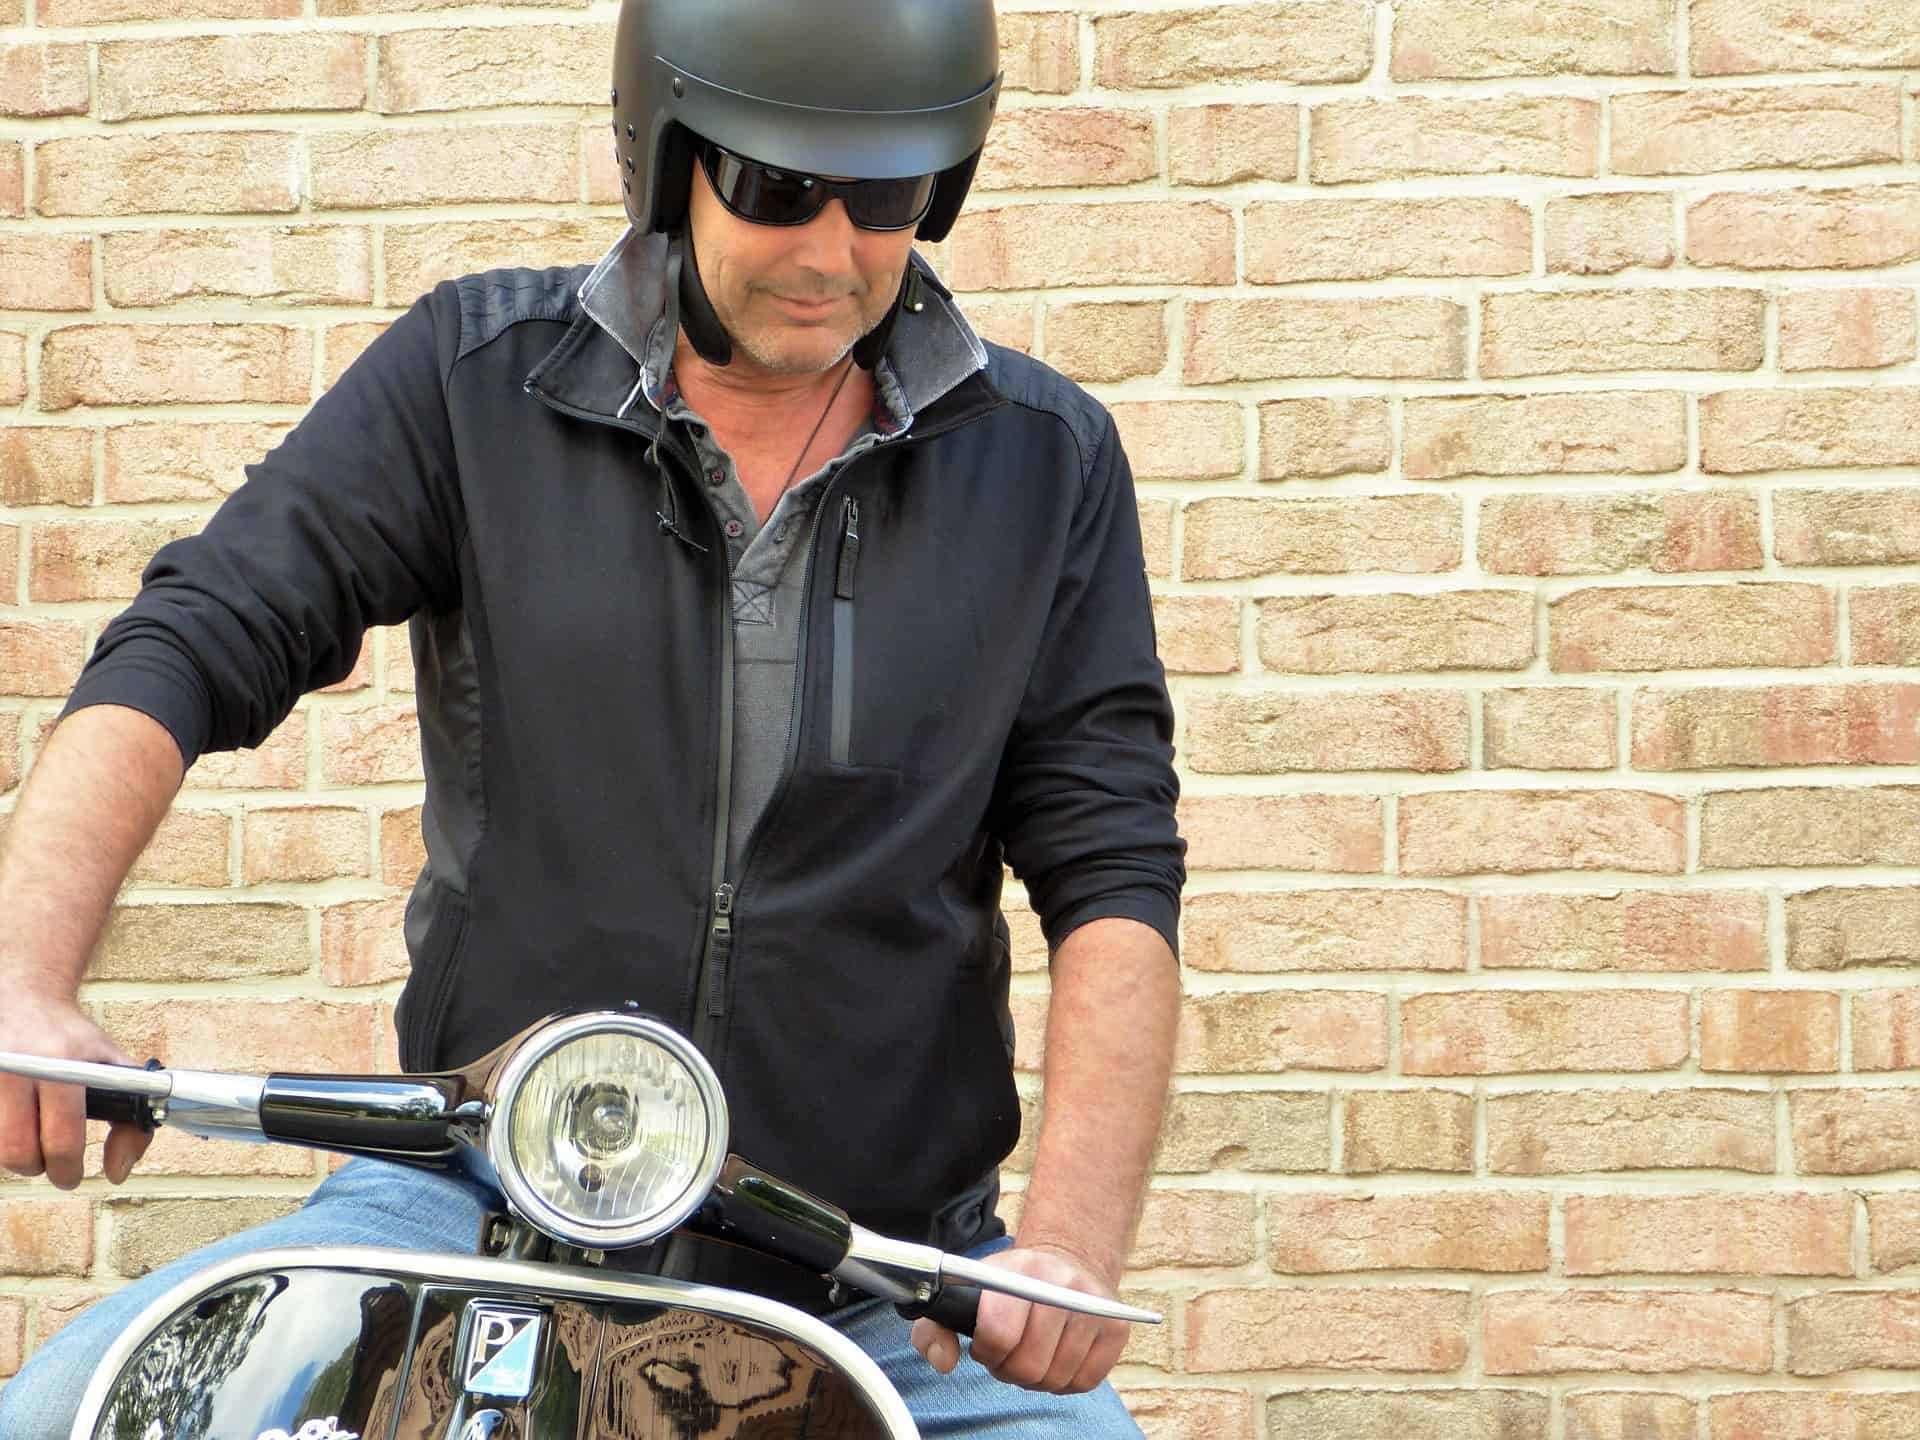 helmet fit shades